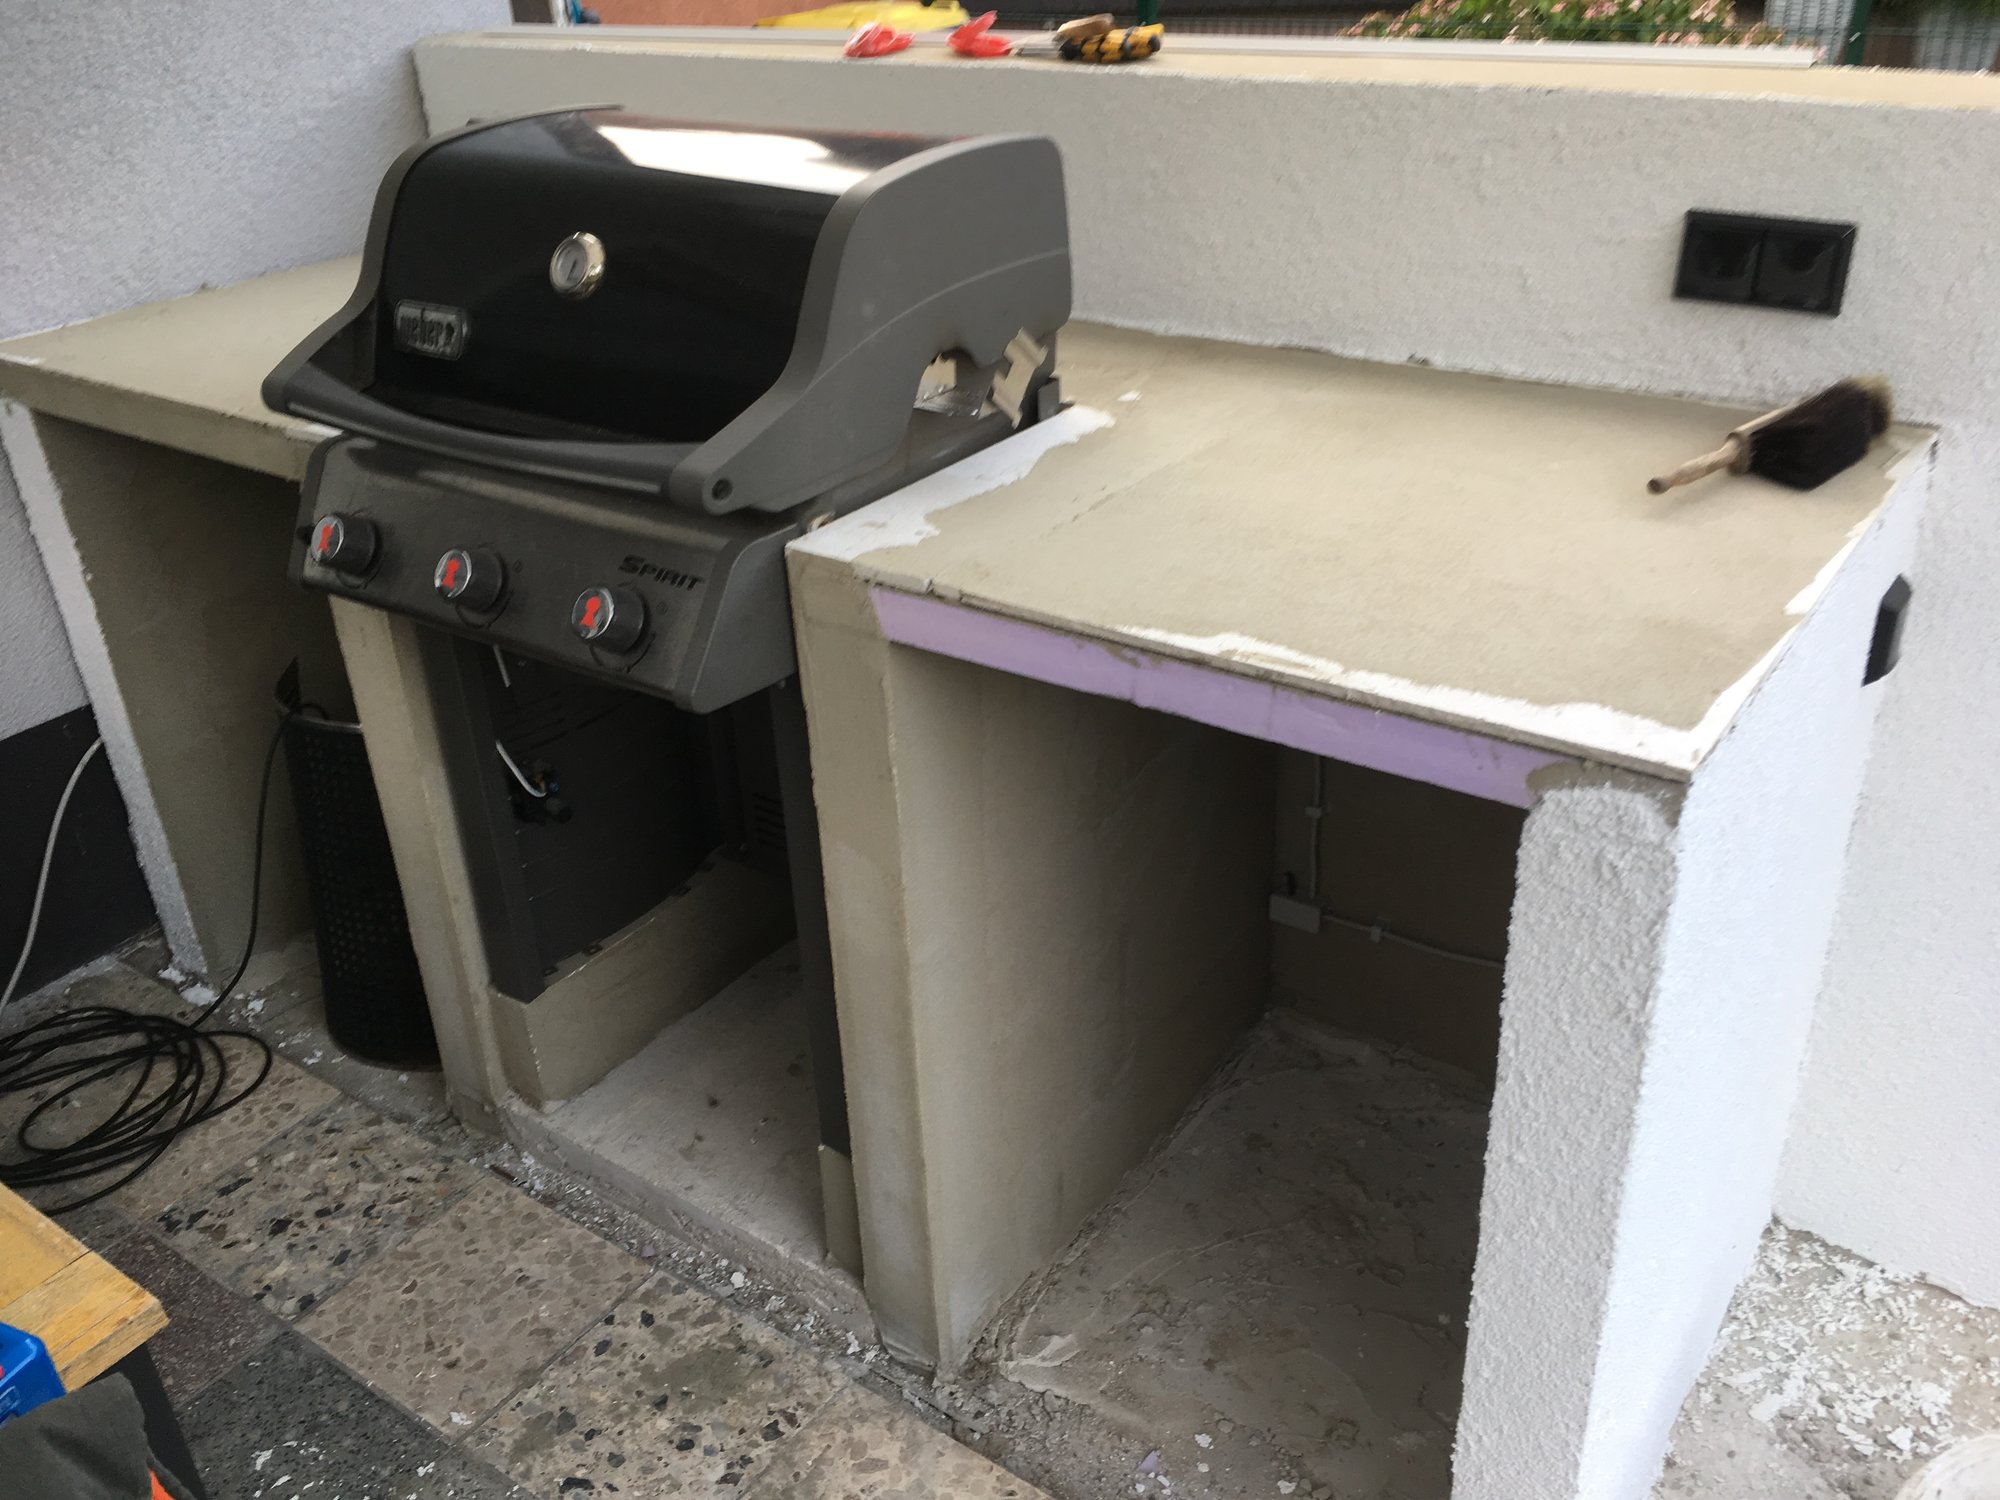 Weber Outdoor Küche Edelstahl : Weber outdoor küche mm edelstahl grillrost für weber genesis